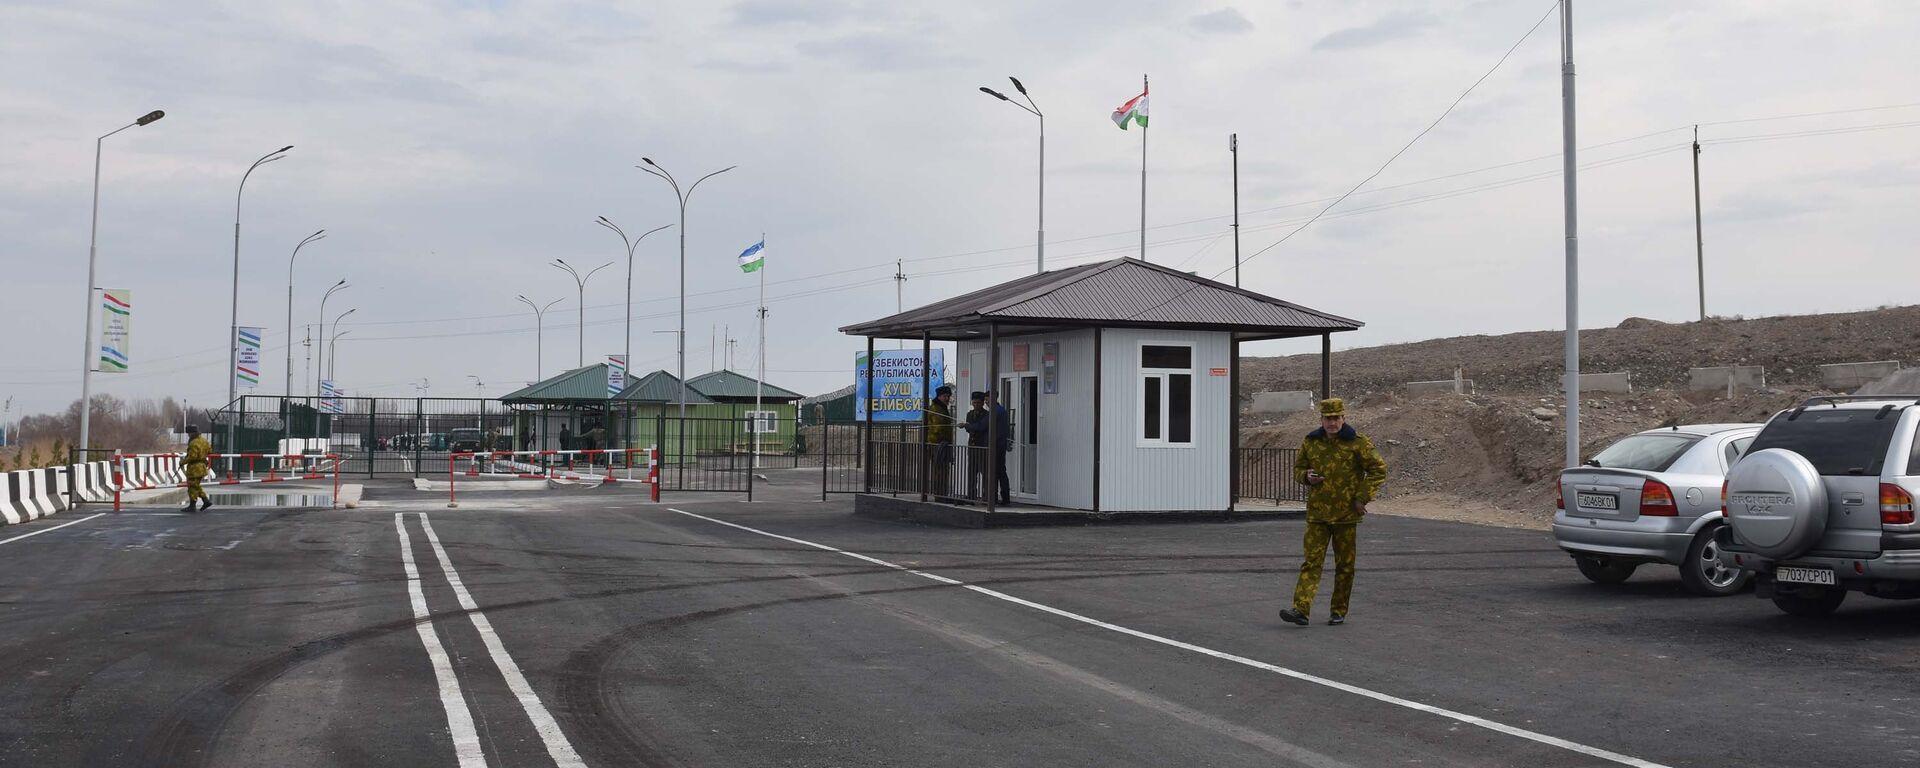 КПП Равот на границе Таджикистана и Узбекистана в городе Канибадам, архивное фото - Sputnik Тоҷикистон, 1920, 28.06.2021